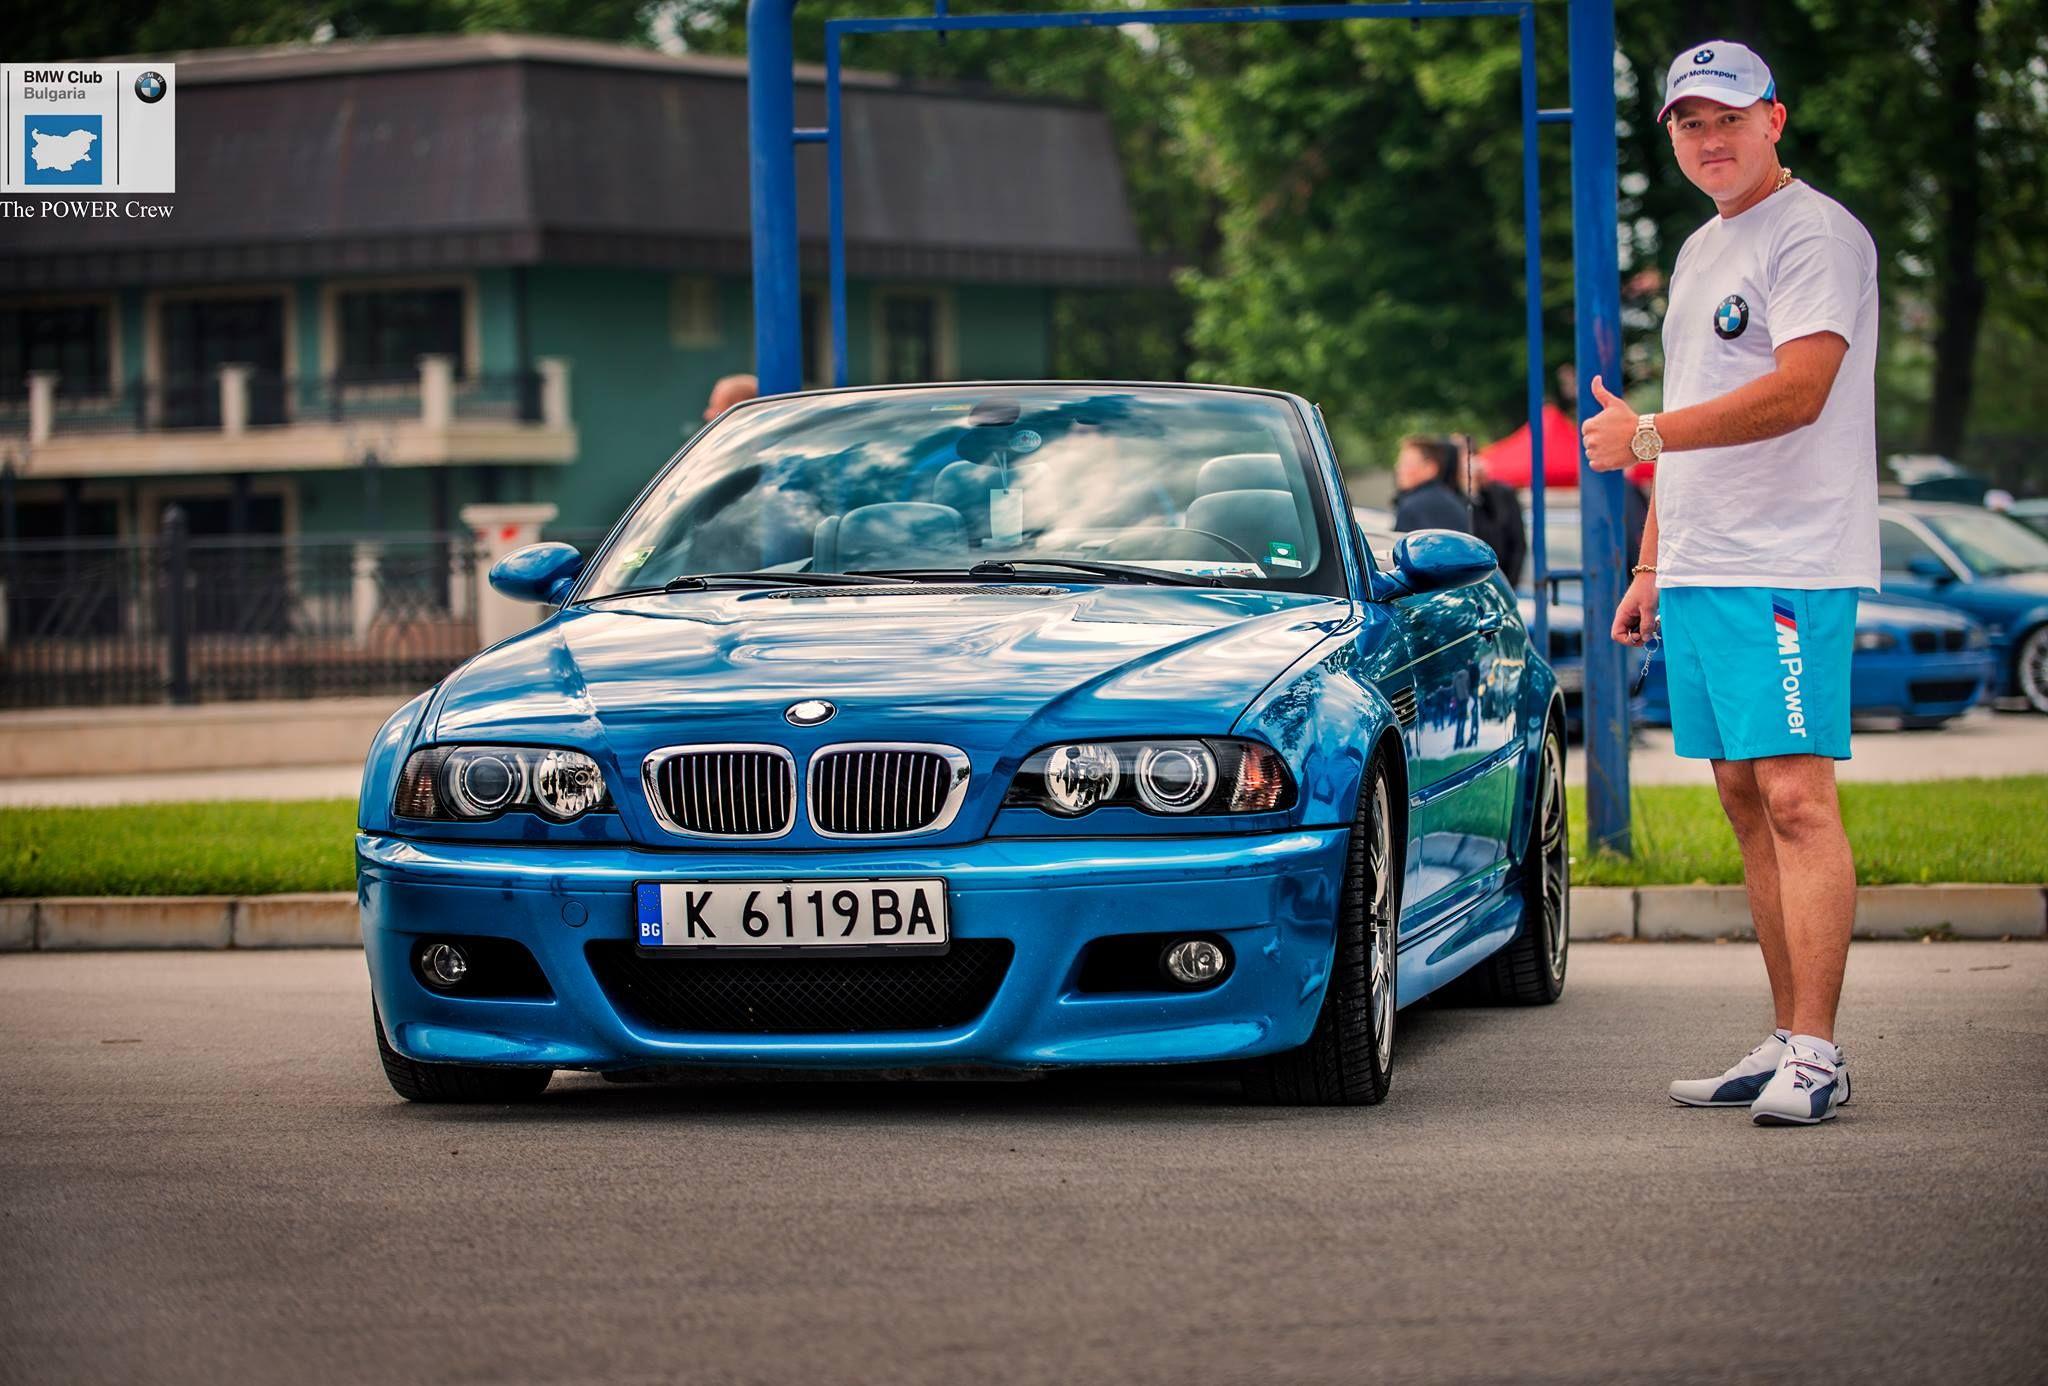 Bmw E46 M3 Convertible Light Blue Bulgaria Plovdiv